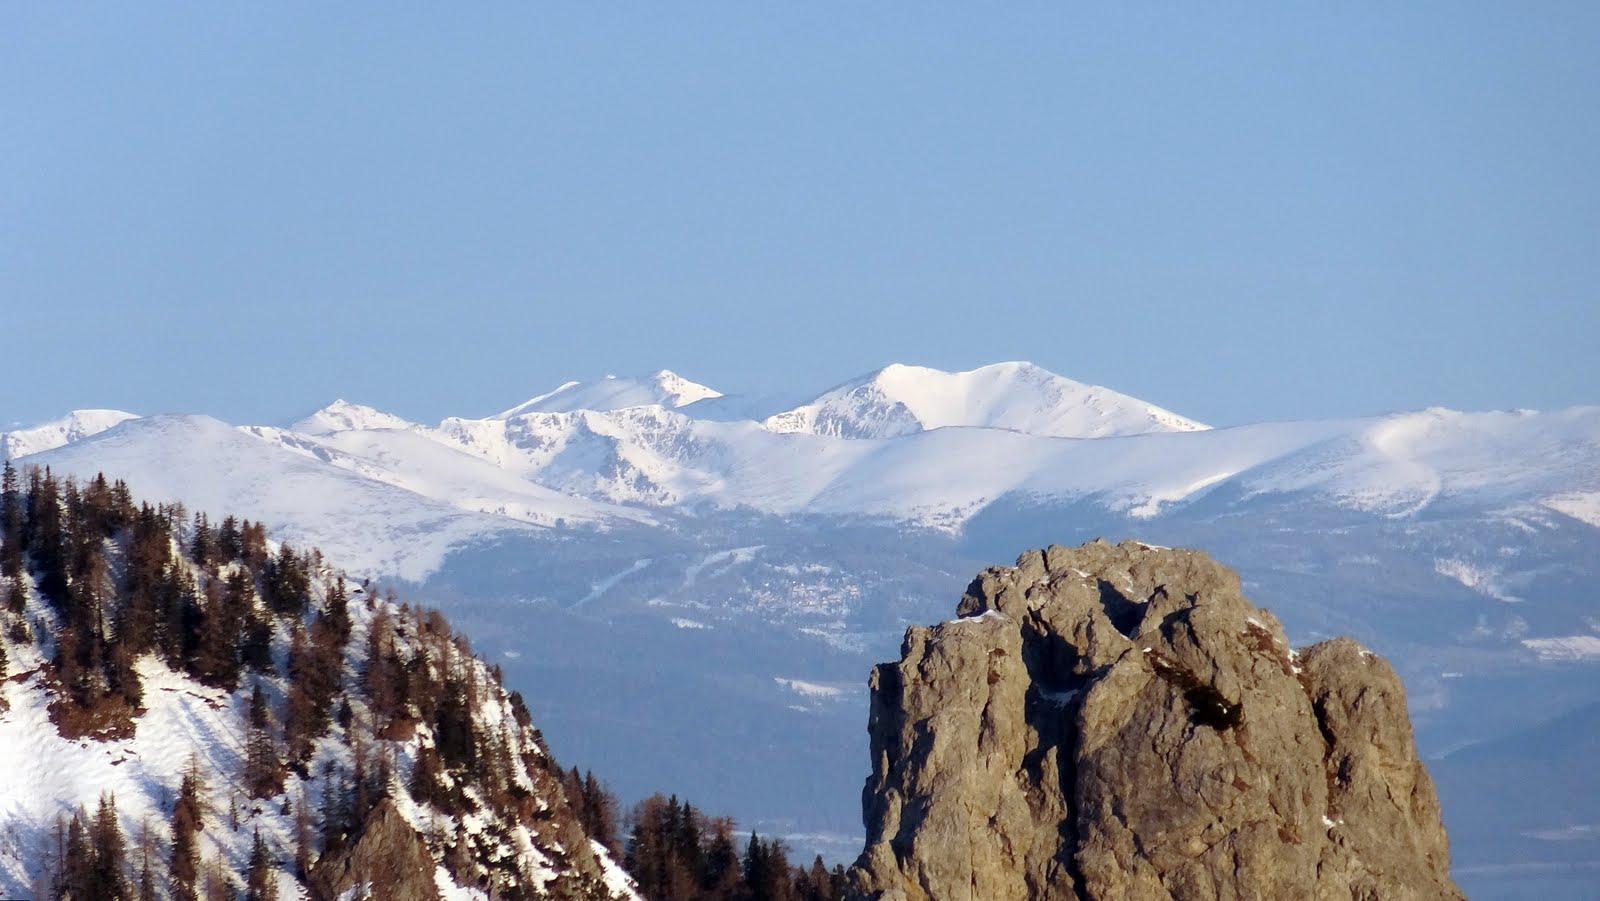 južne padine austrijskih brega, to bi možda bile Kaerntner Alpen...